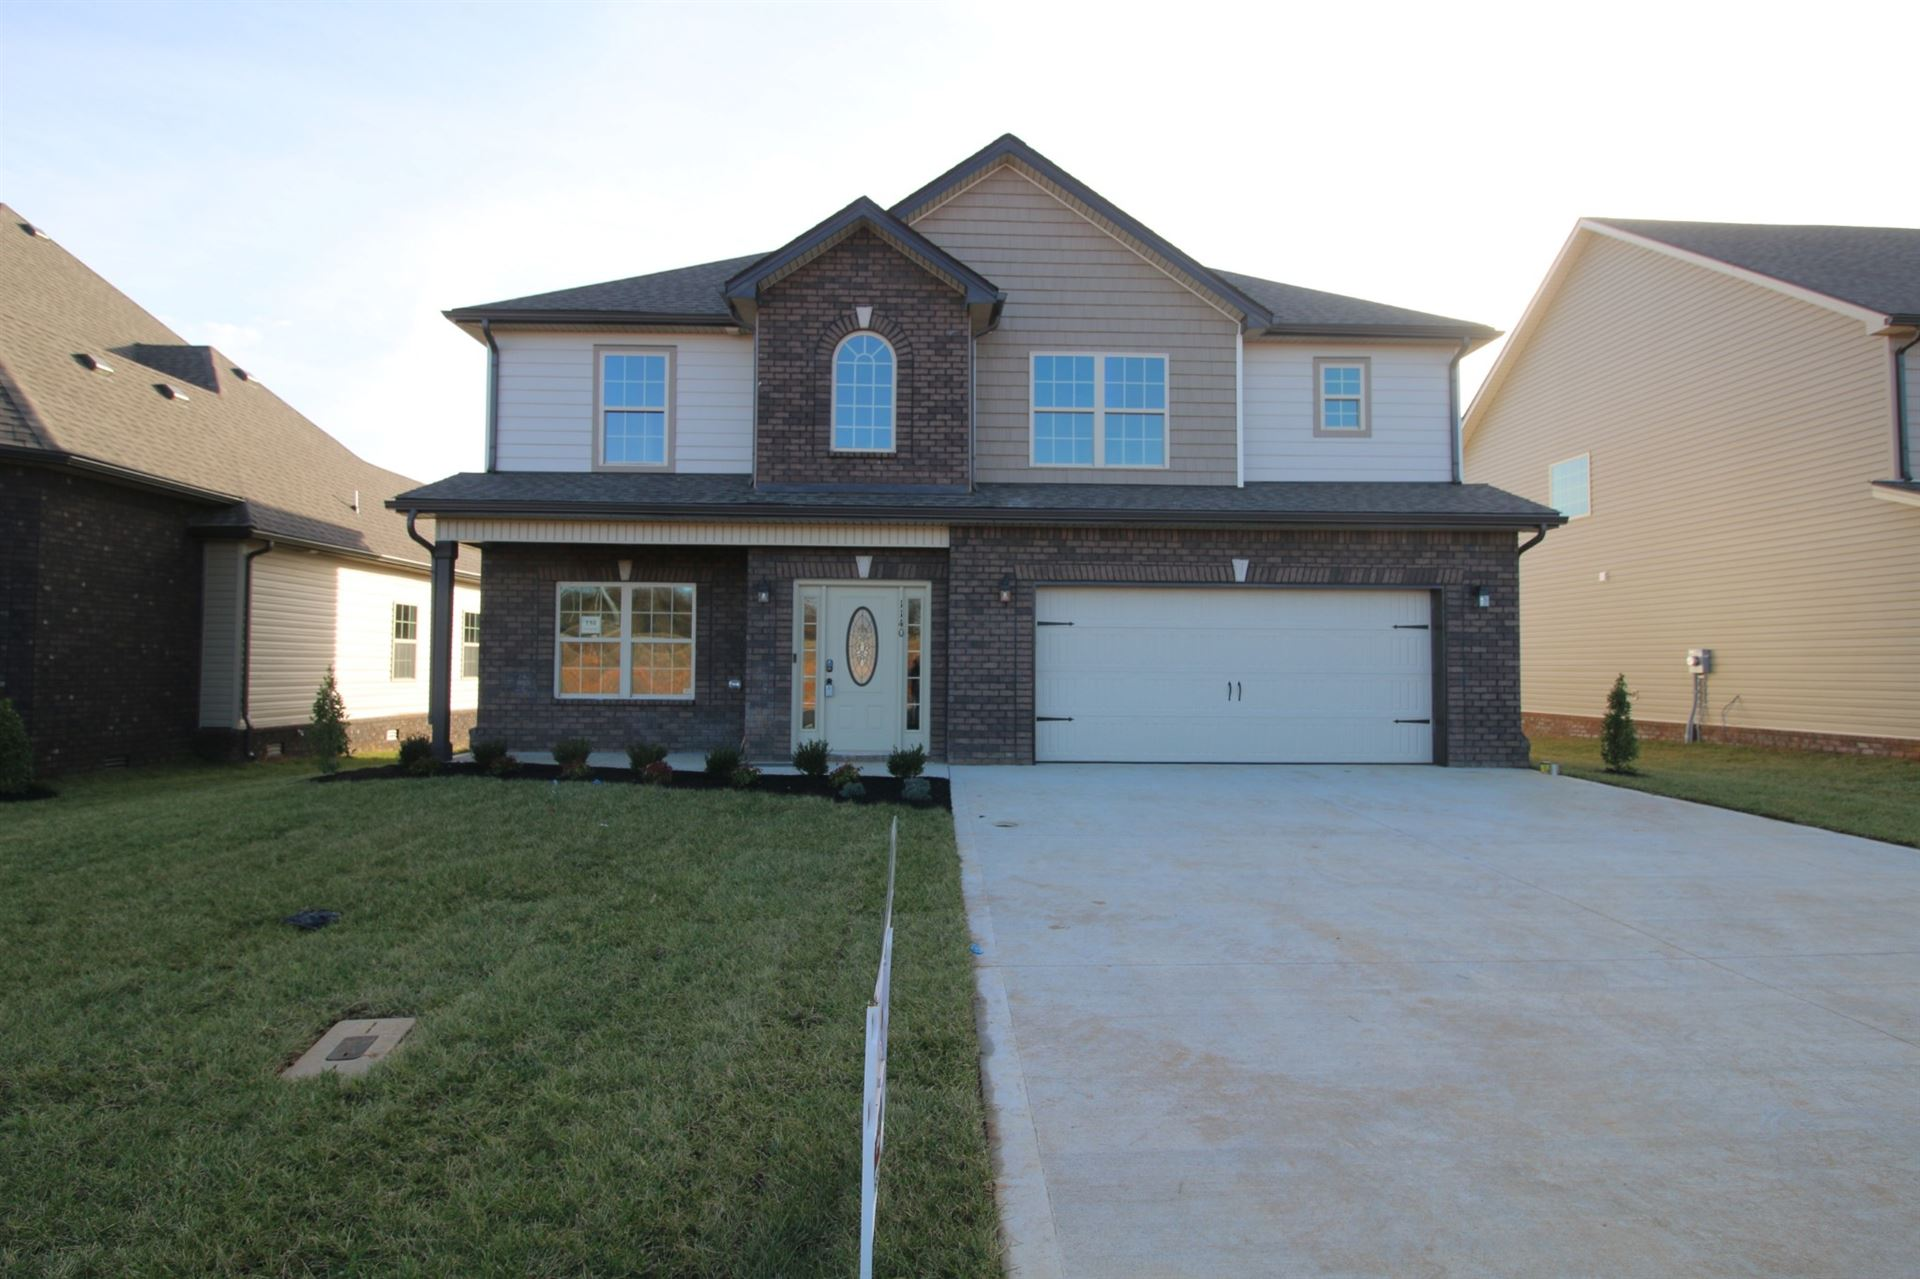 198 Charleston Oaks Reserves, Clarksville, TN 37042 - MLS#: 2289999